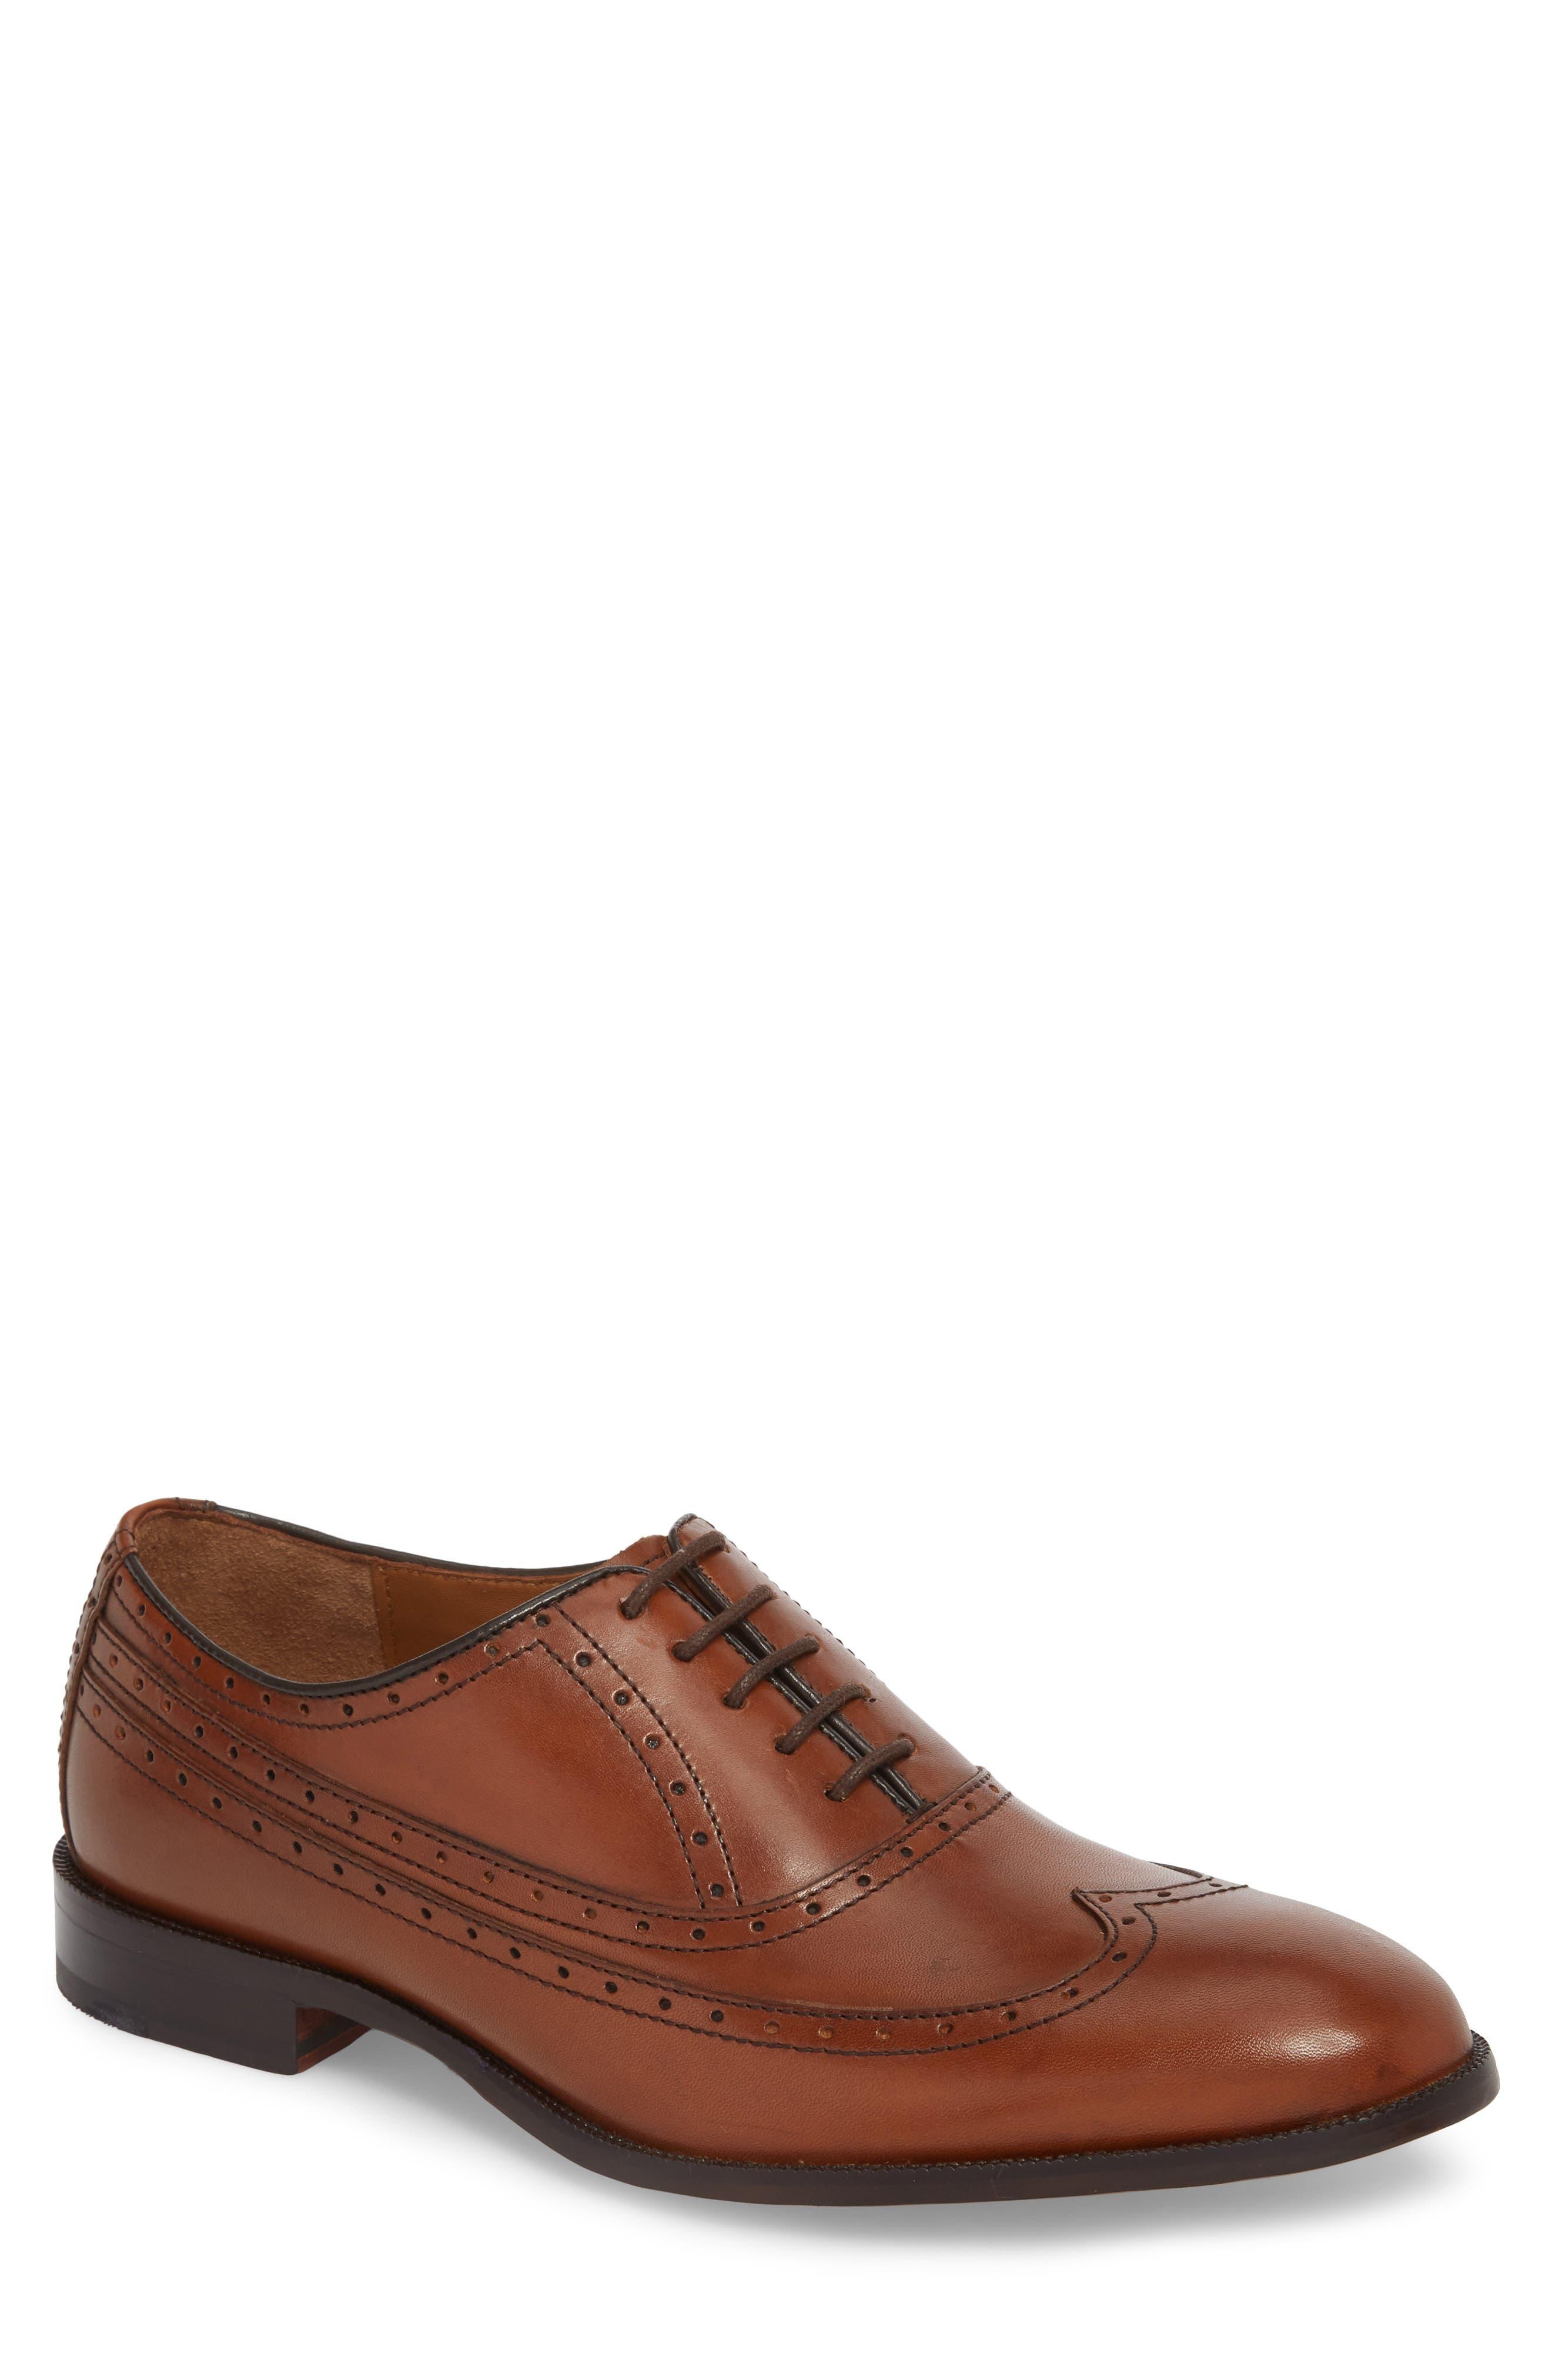 Bradford Wingtip Oxford,                         Main,                         color, Tan Leather